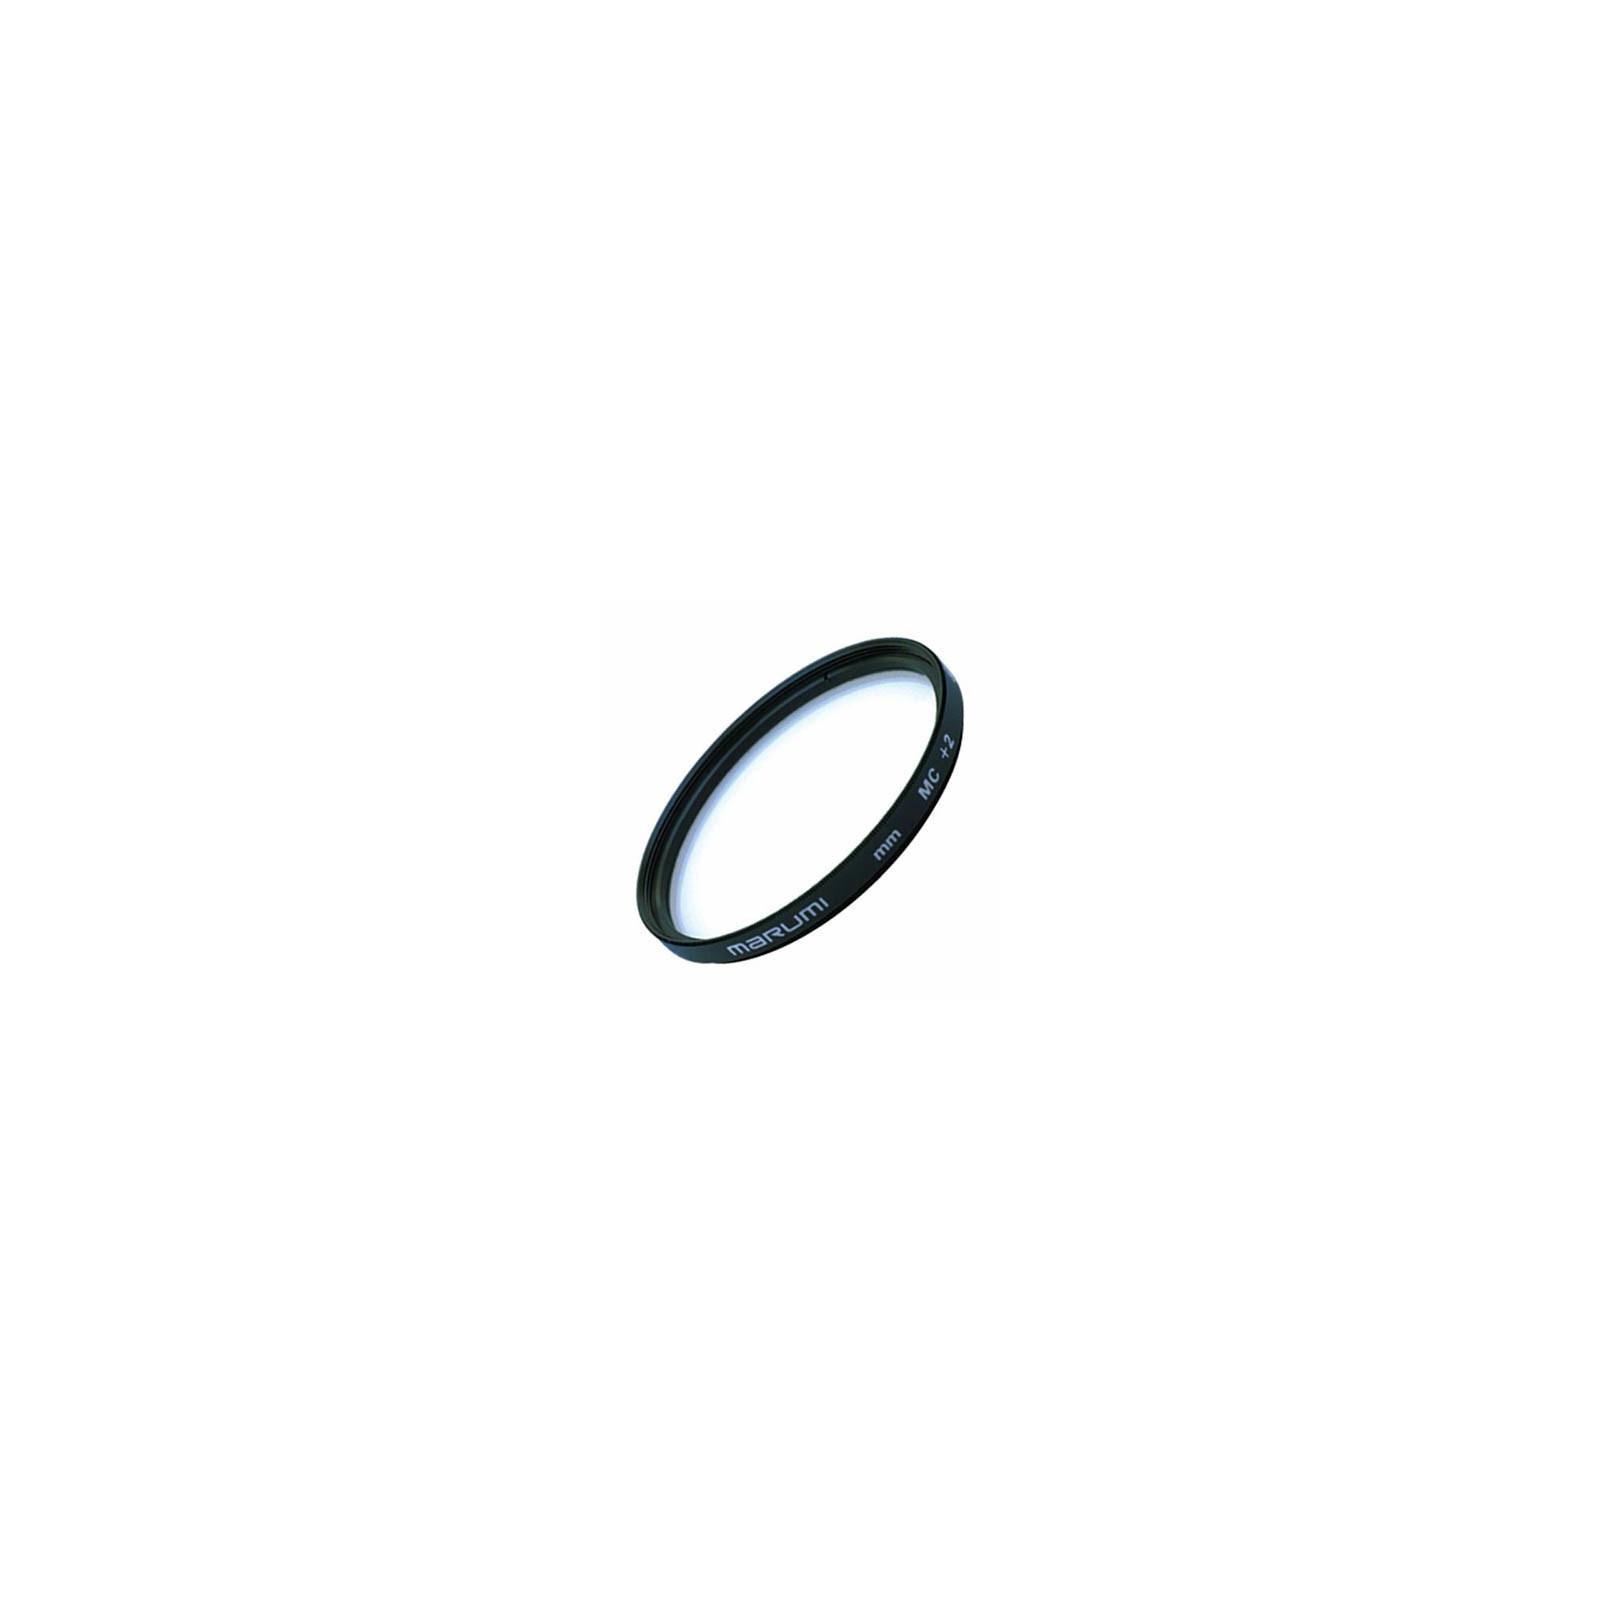 Светофильтр Marumi Close-up+2 MC 62mm